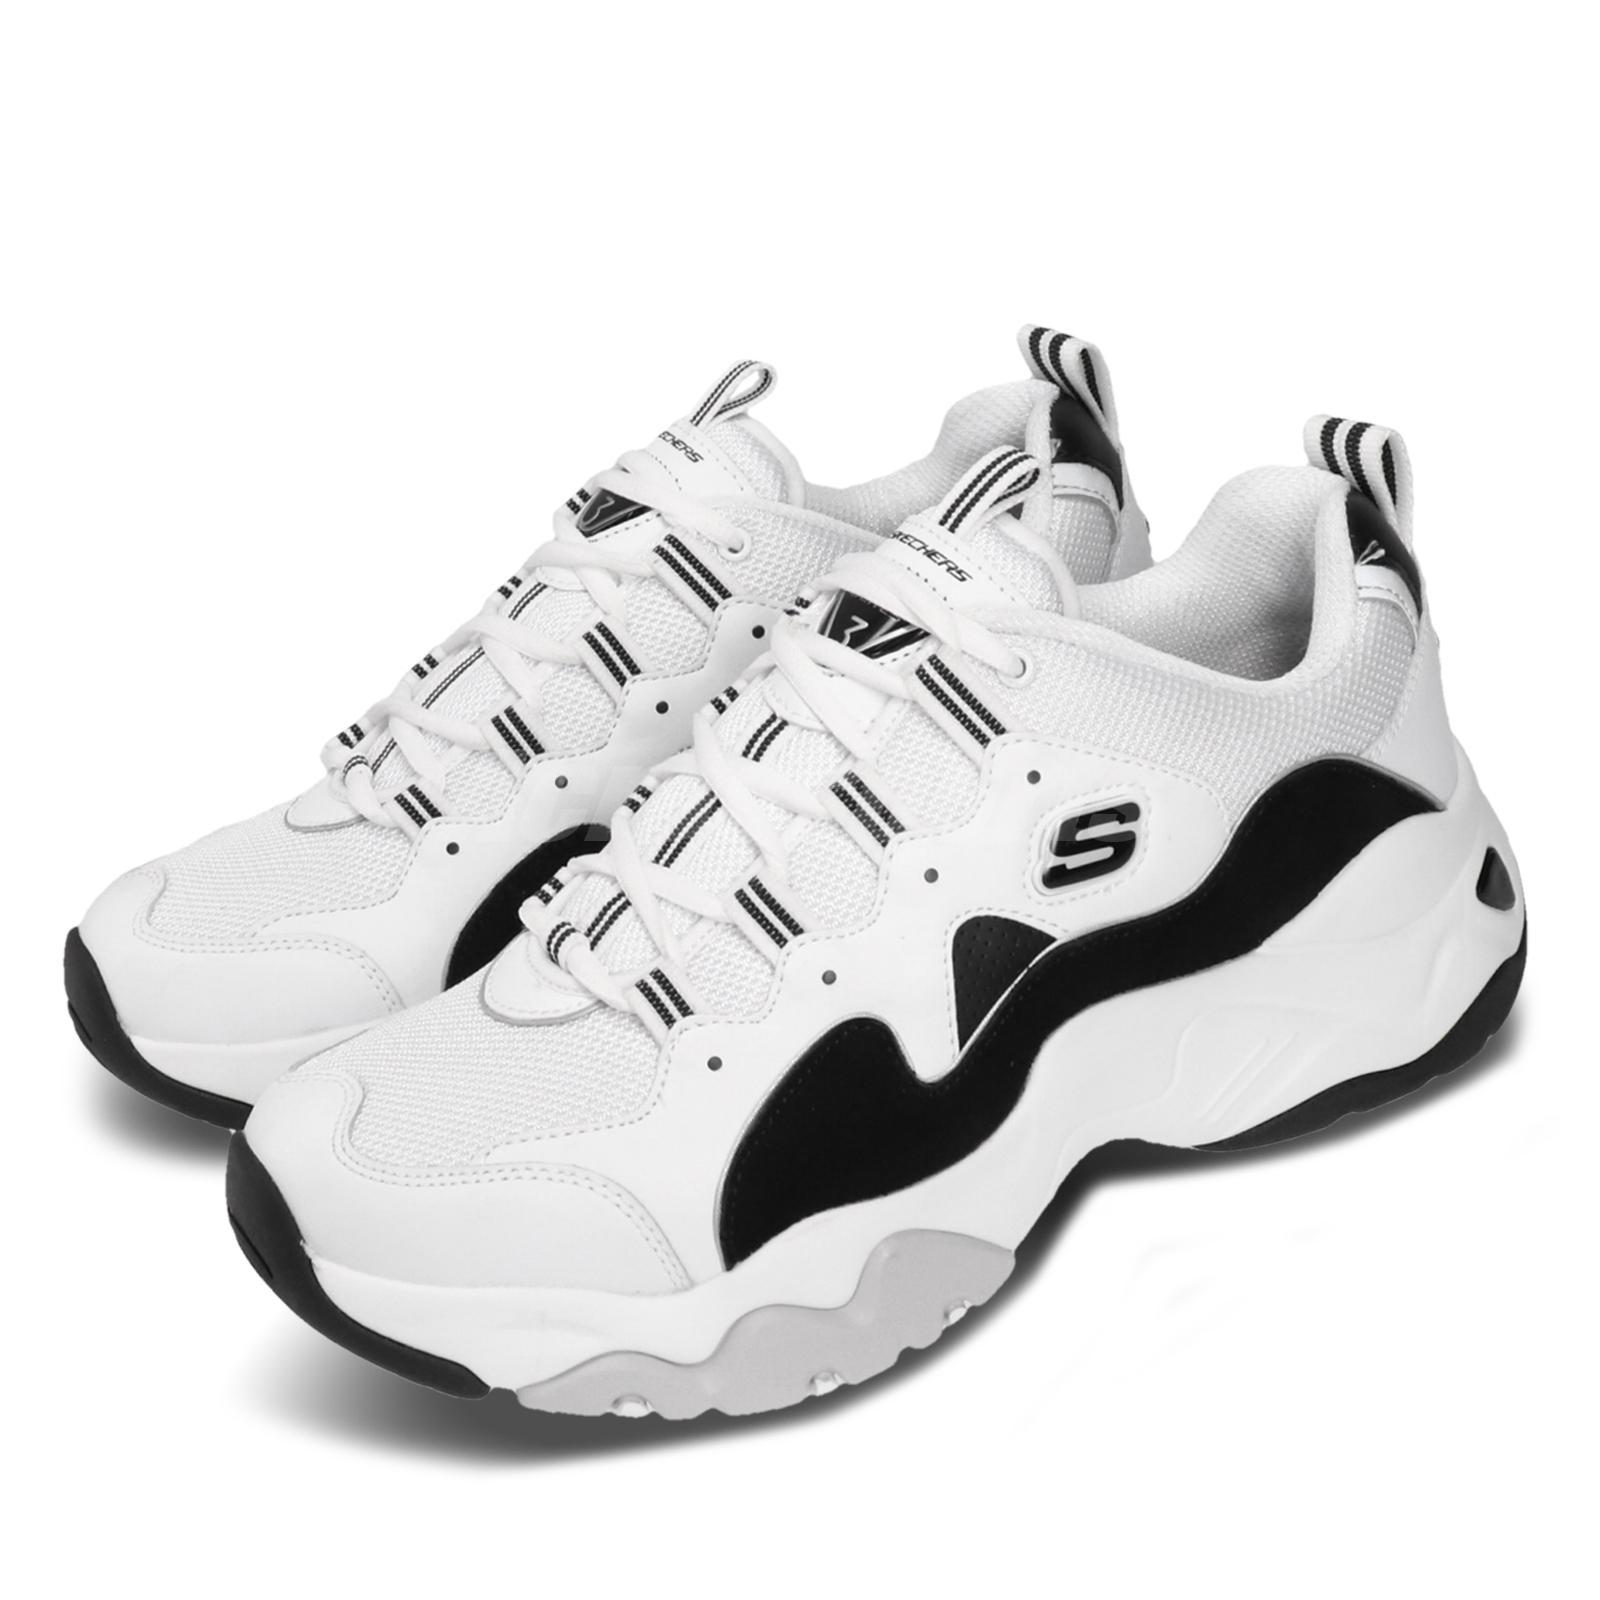 Skechers D Lites 3-Zenway White Black